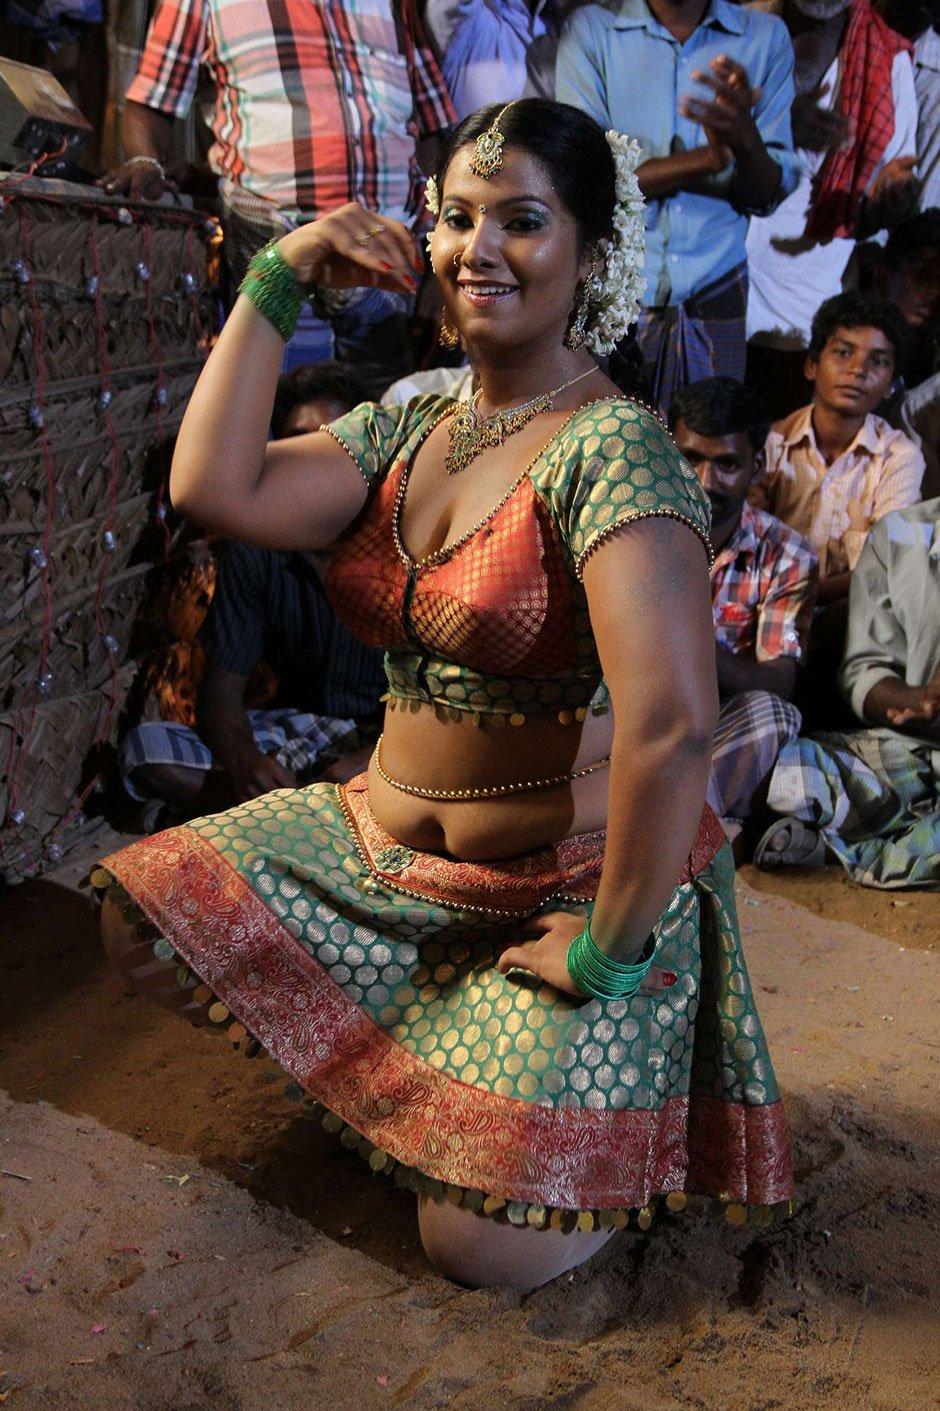 Nanbargal Kavanathirku Tamil Movie Hot Stills - Photo 12 of 37